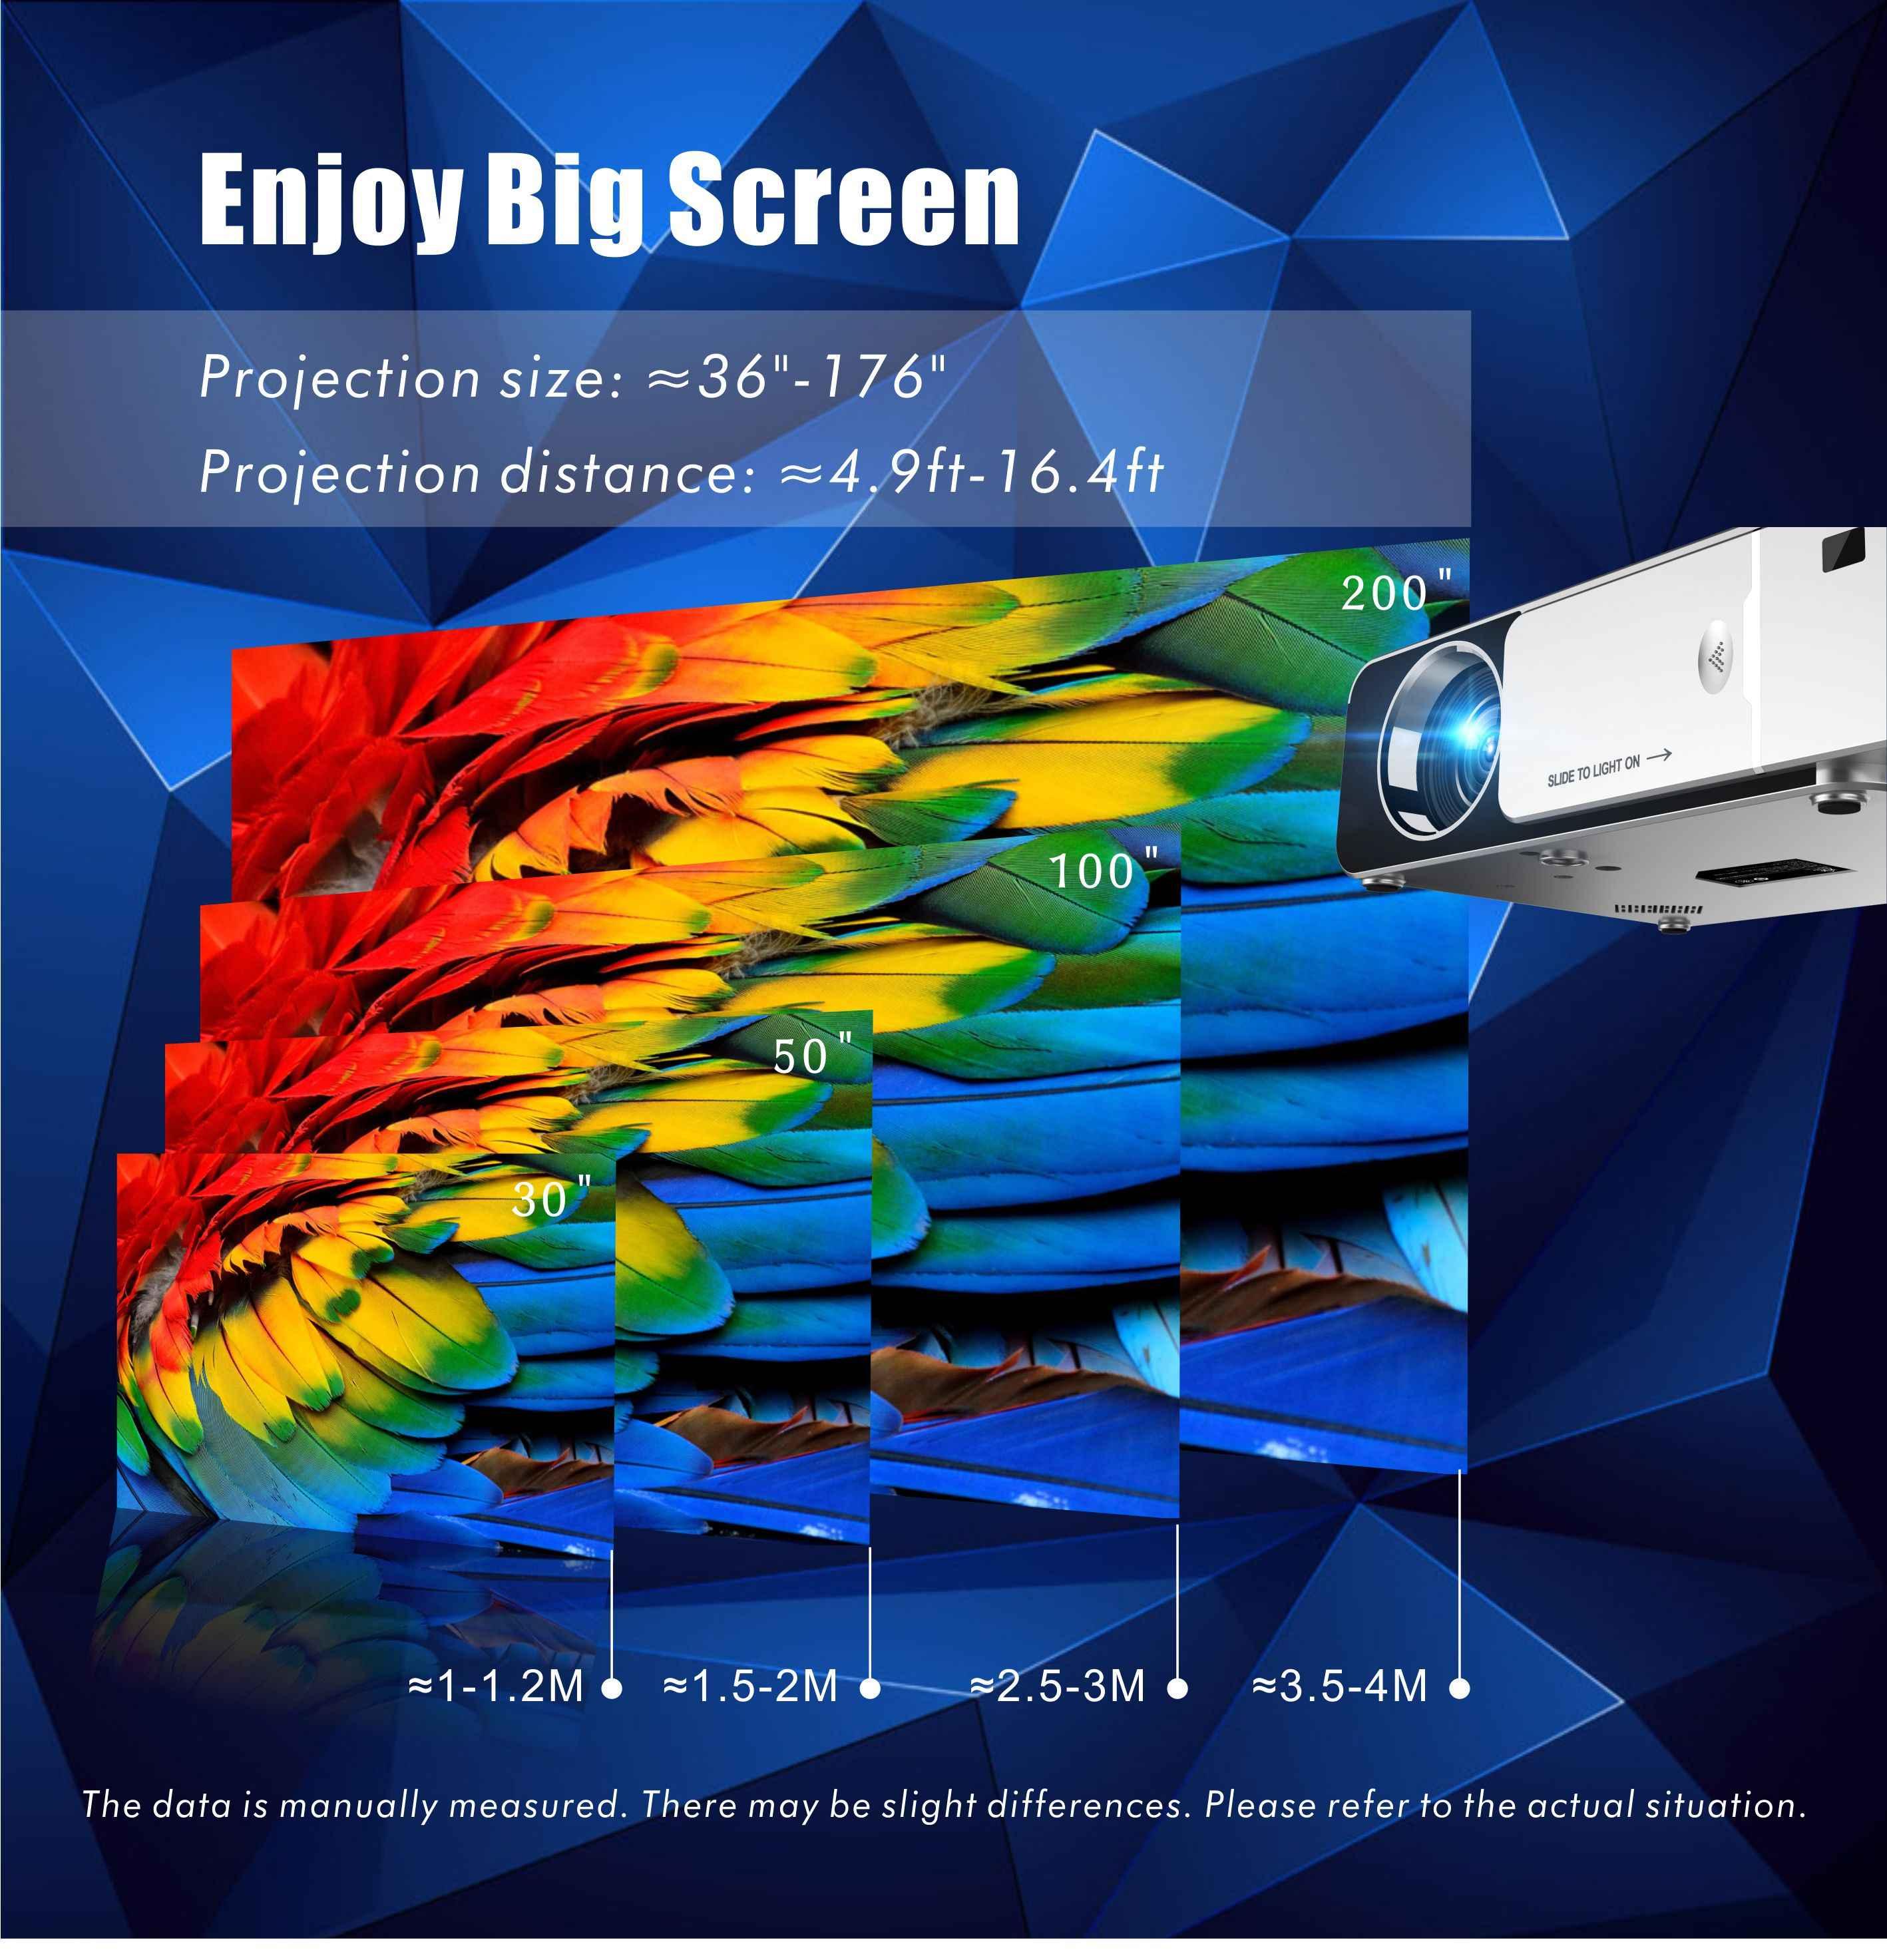 UNIC yeni T6 tam 1080P projektör 3500 lümen ev sineması Beamer desteği AirPlay DLNA Miracast Android WIFI isteğe bağlı projektör